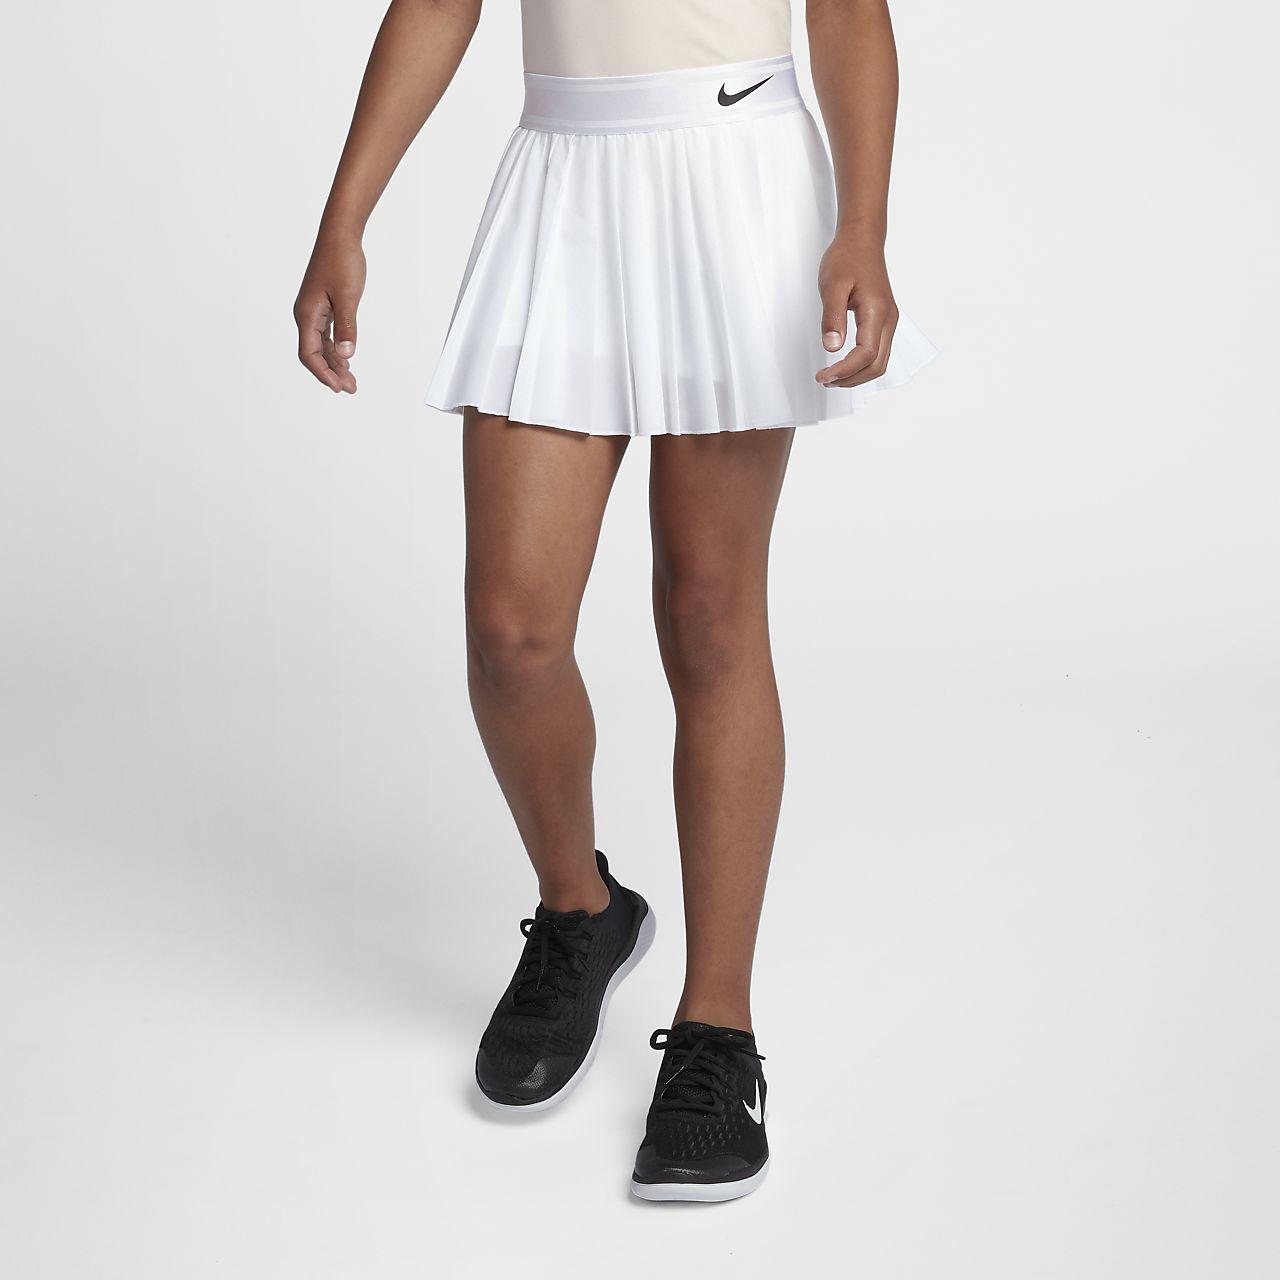 5cae2be39a NikeCourt Victory Older Kids' (Girls') Tennis Skirt. Nike.com CH